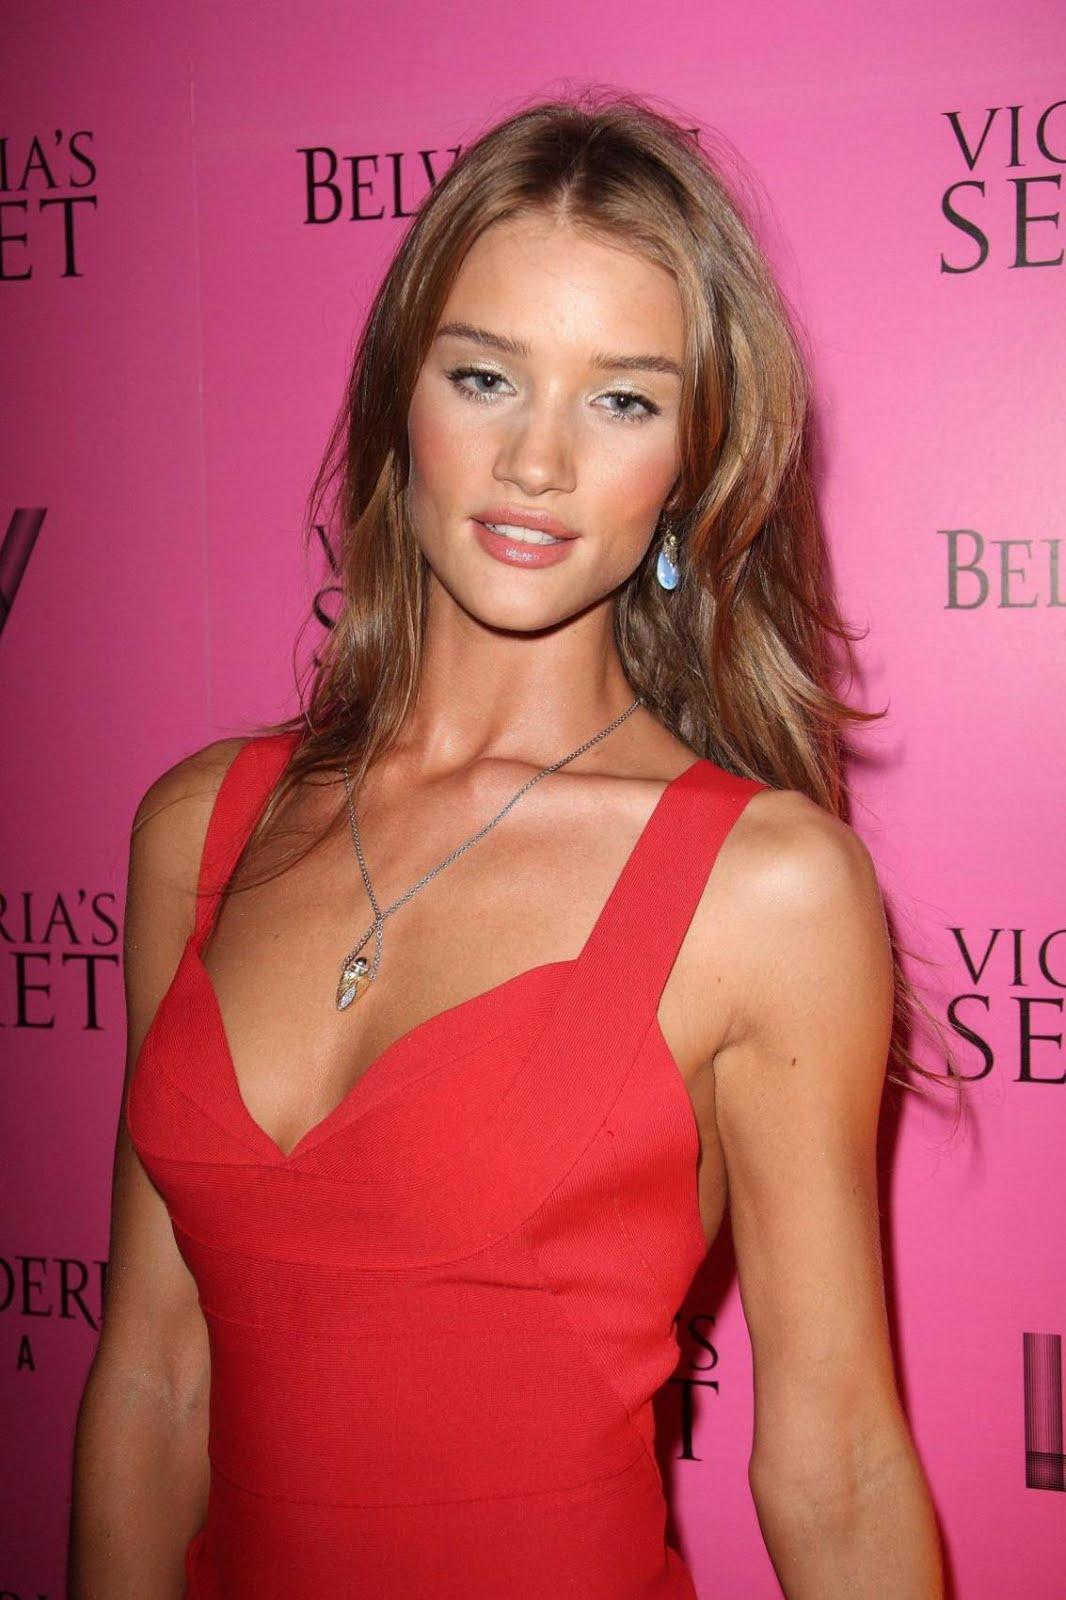 http://4.bp.blogspot.com/-epaeR5gnJt0/ToiRwBJd9KI/AAAAAAAAG7g/LJCCdh-W4Dw/s1600/Rosie-Huntington-Whiteley-%2540-Victorias-Secret-Fashion-Show.jpg